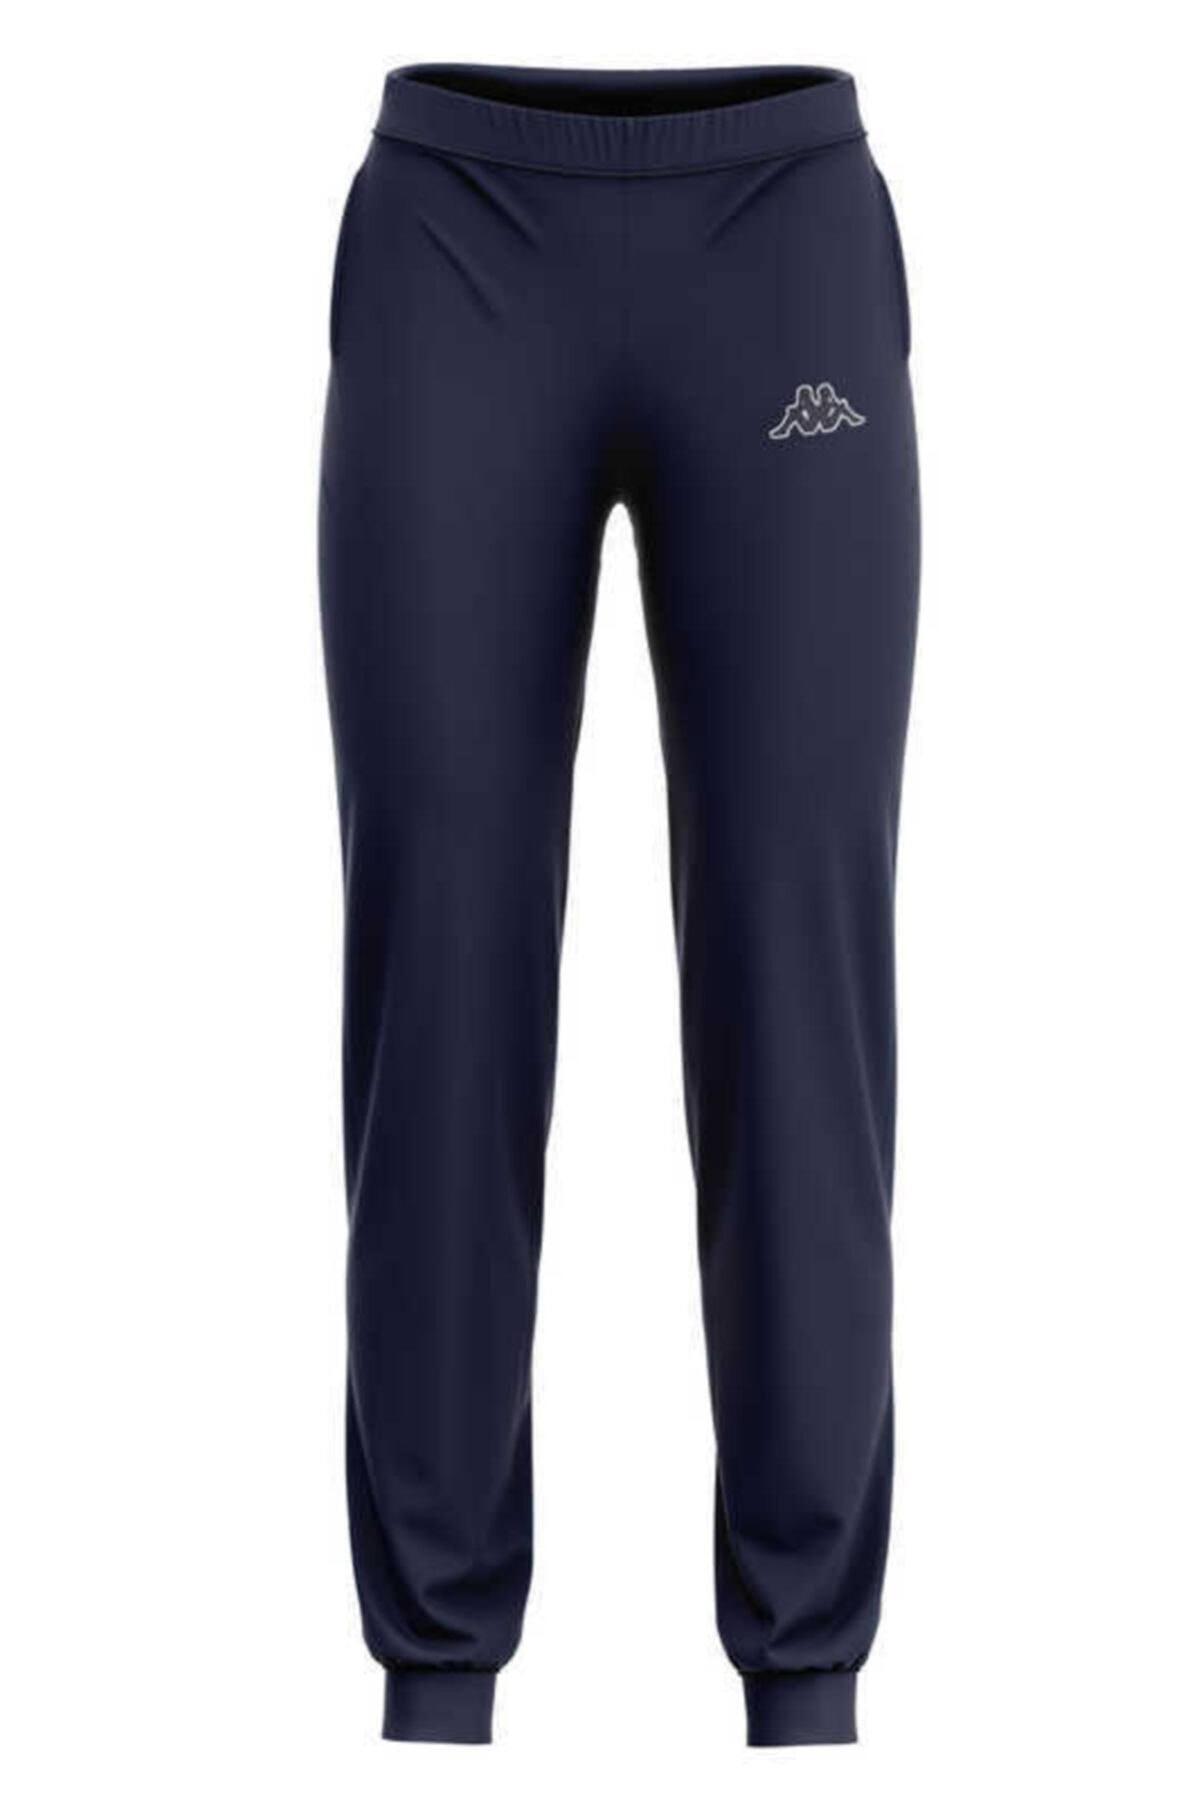 Kappa Kadın Lacivert Sweat Pantolon Zalıa  S 1